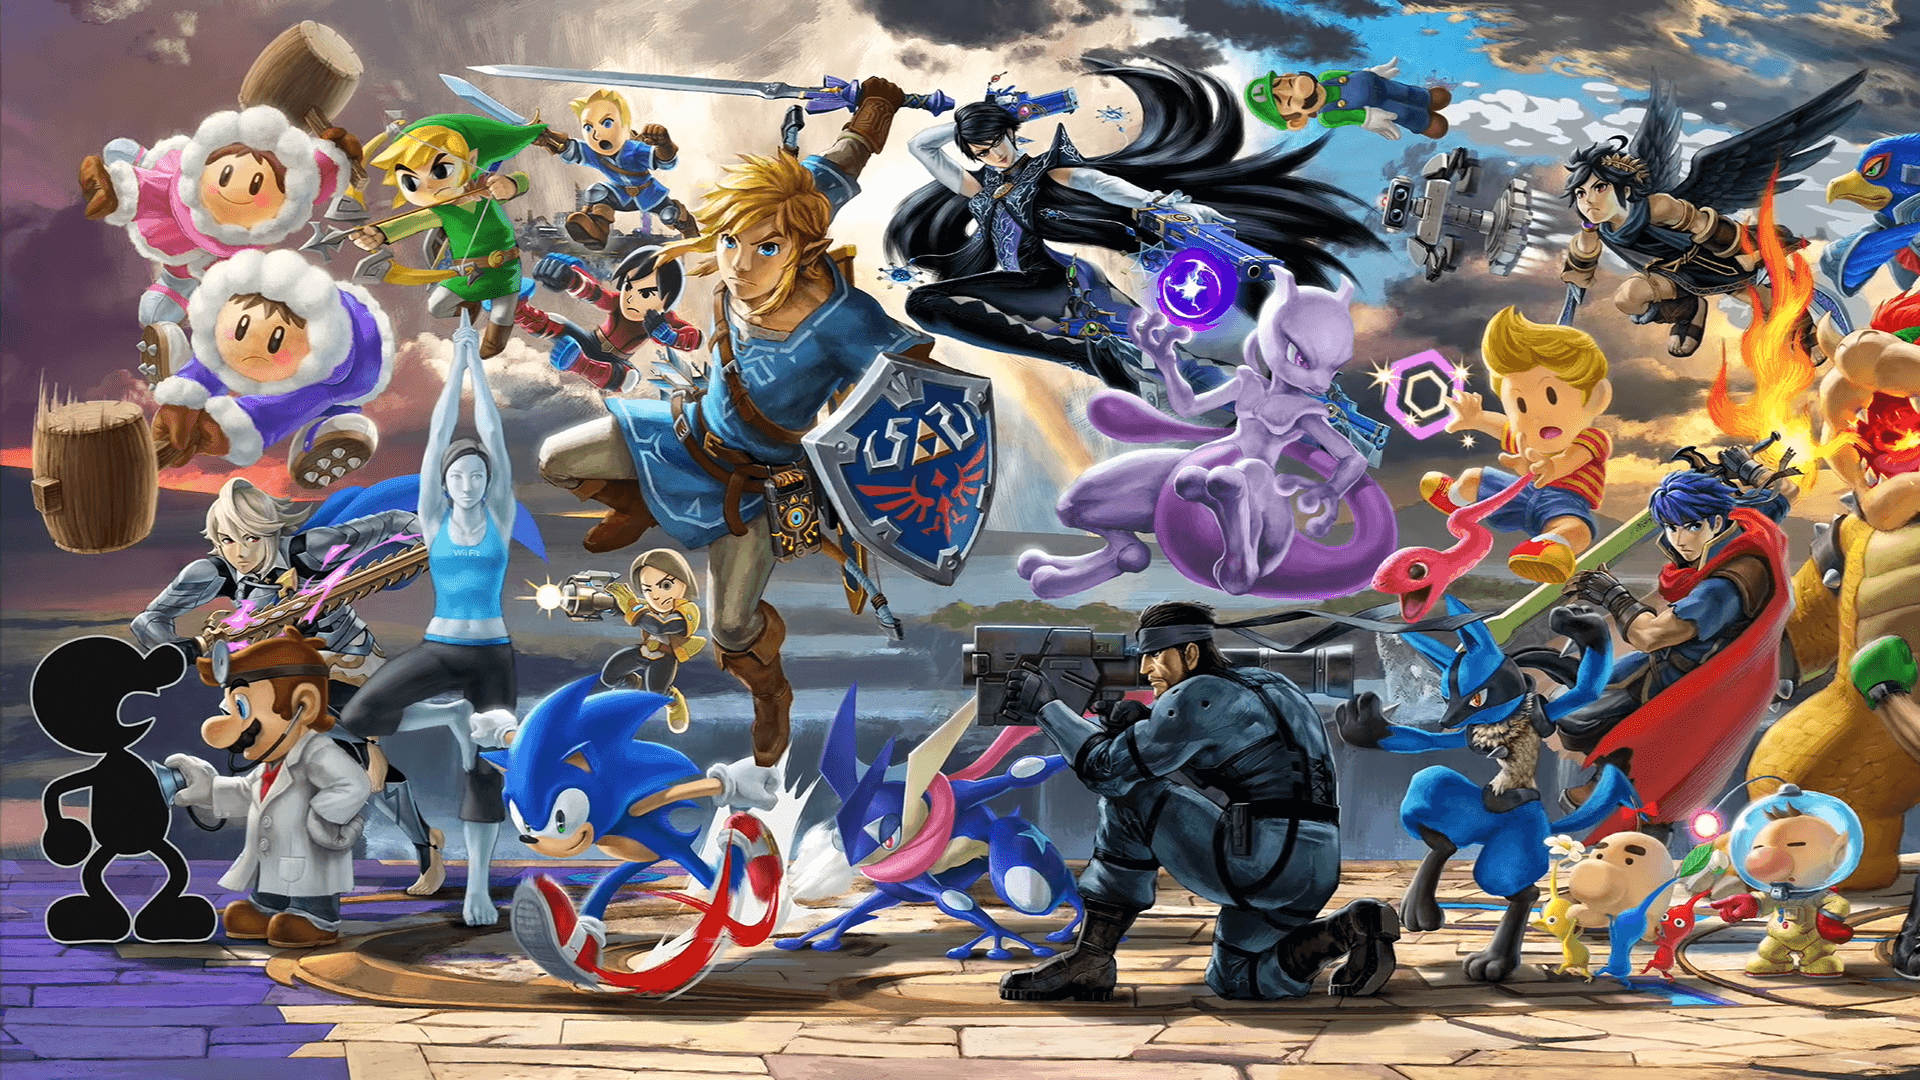 Smash Bros. Ultimate Wallpapers - Wallpaper Cave